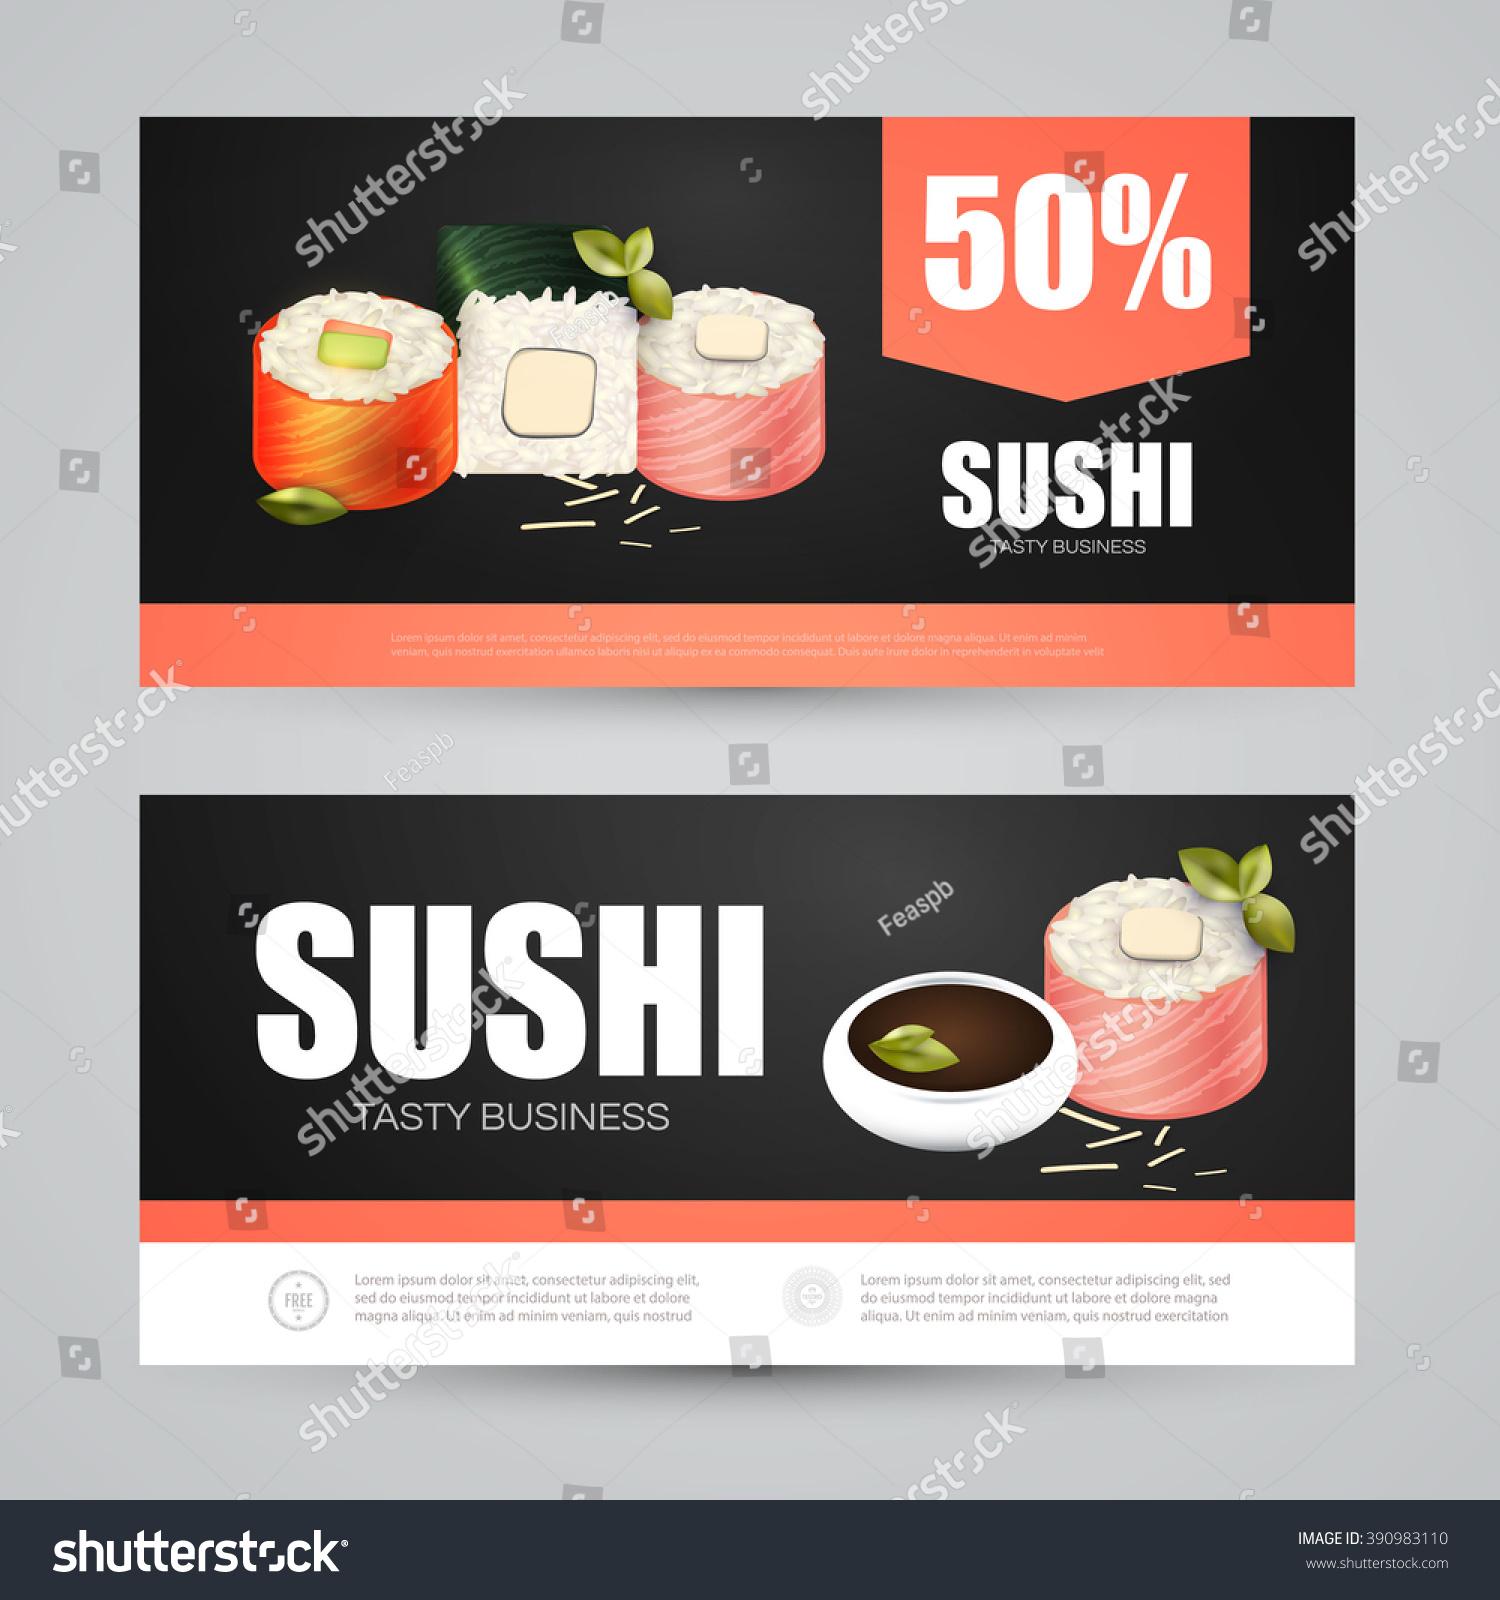 Sushi Flyer Gift Voucher Template Vector Stock Vector 390983110 ...